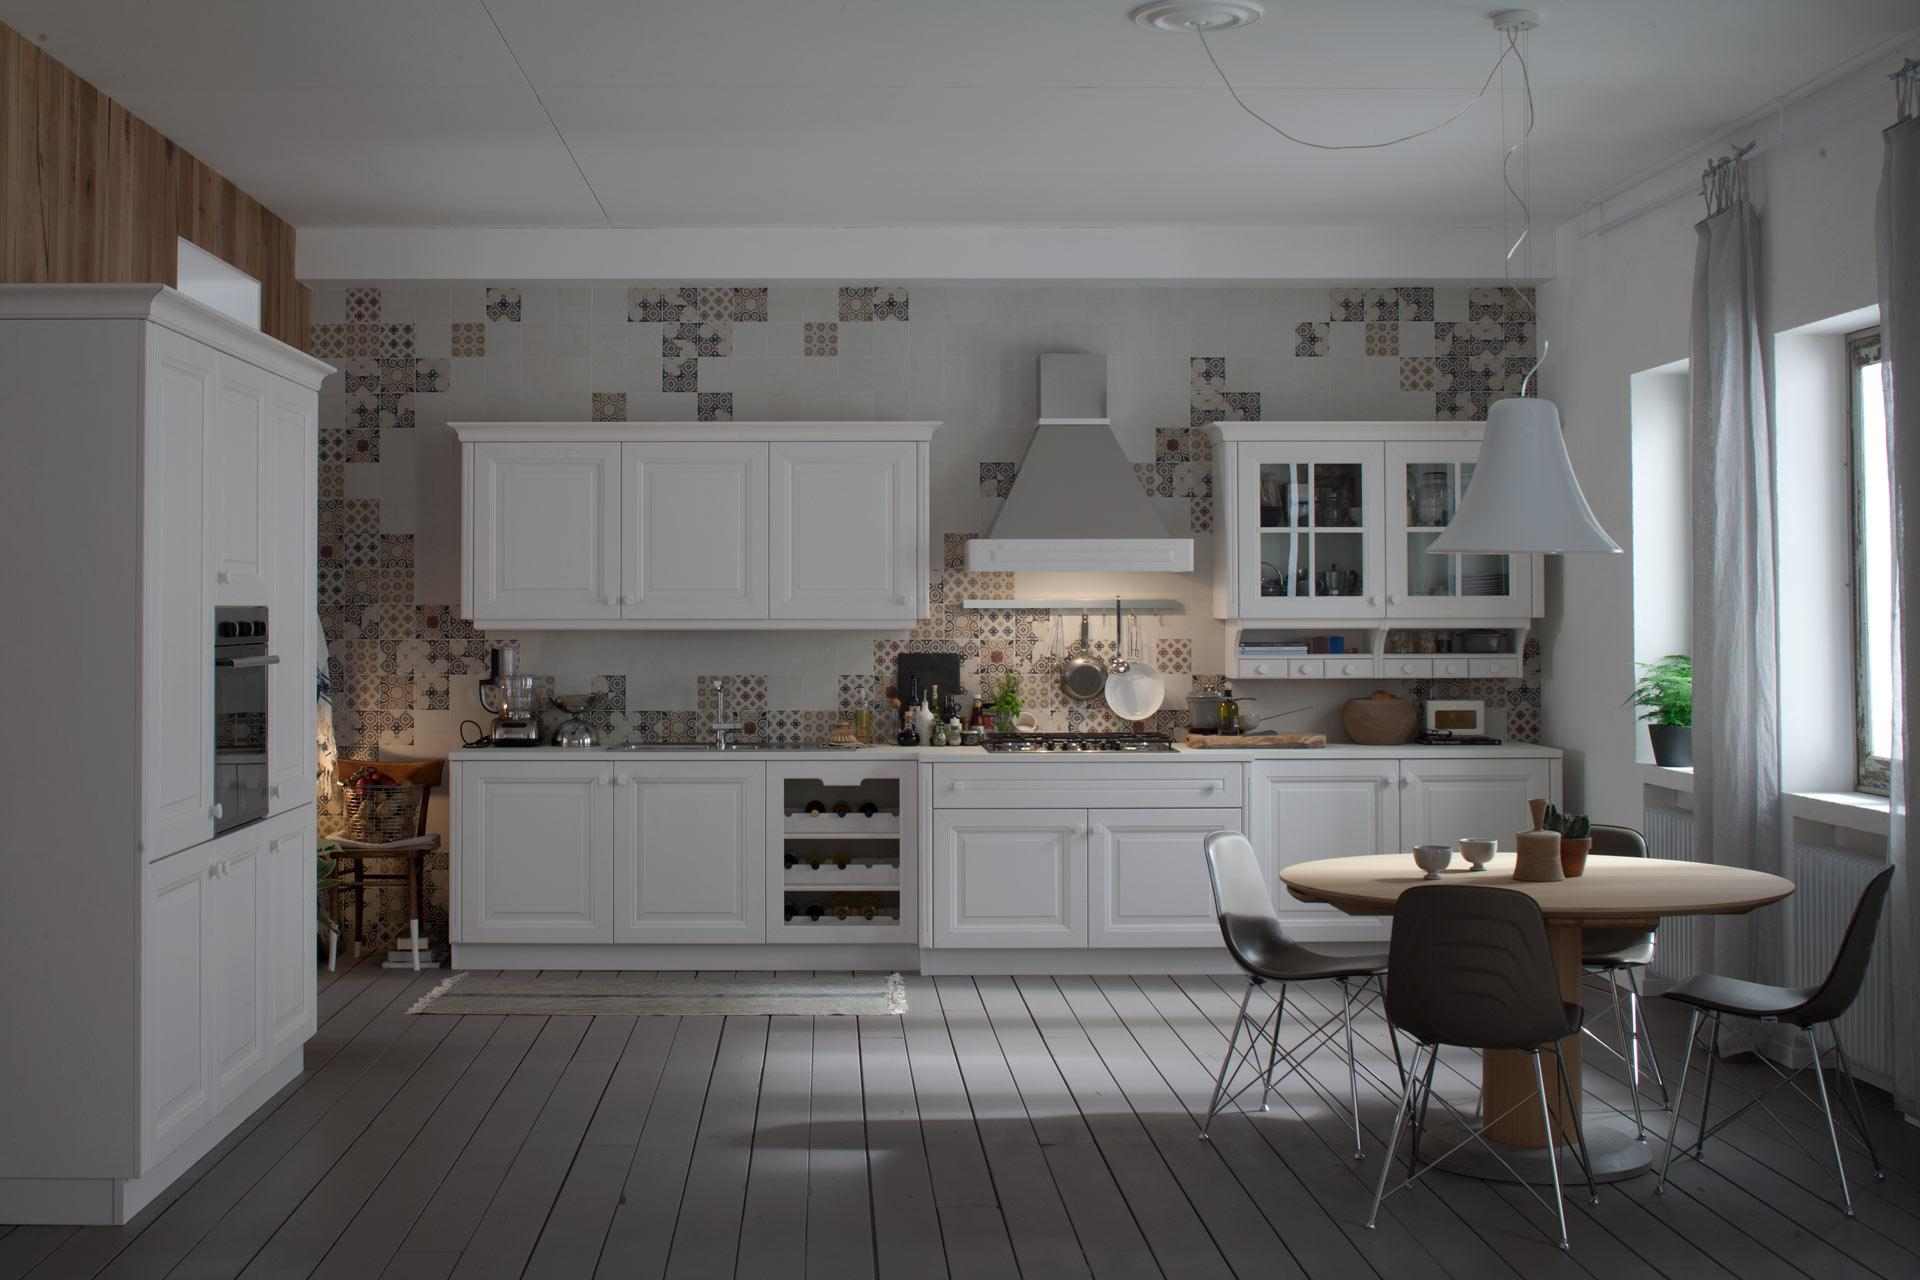 Veneta cucine modello pavese obliquo design - Veneta cucine foto ...